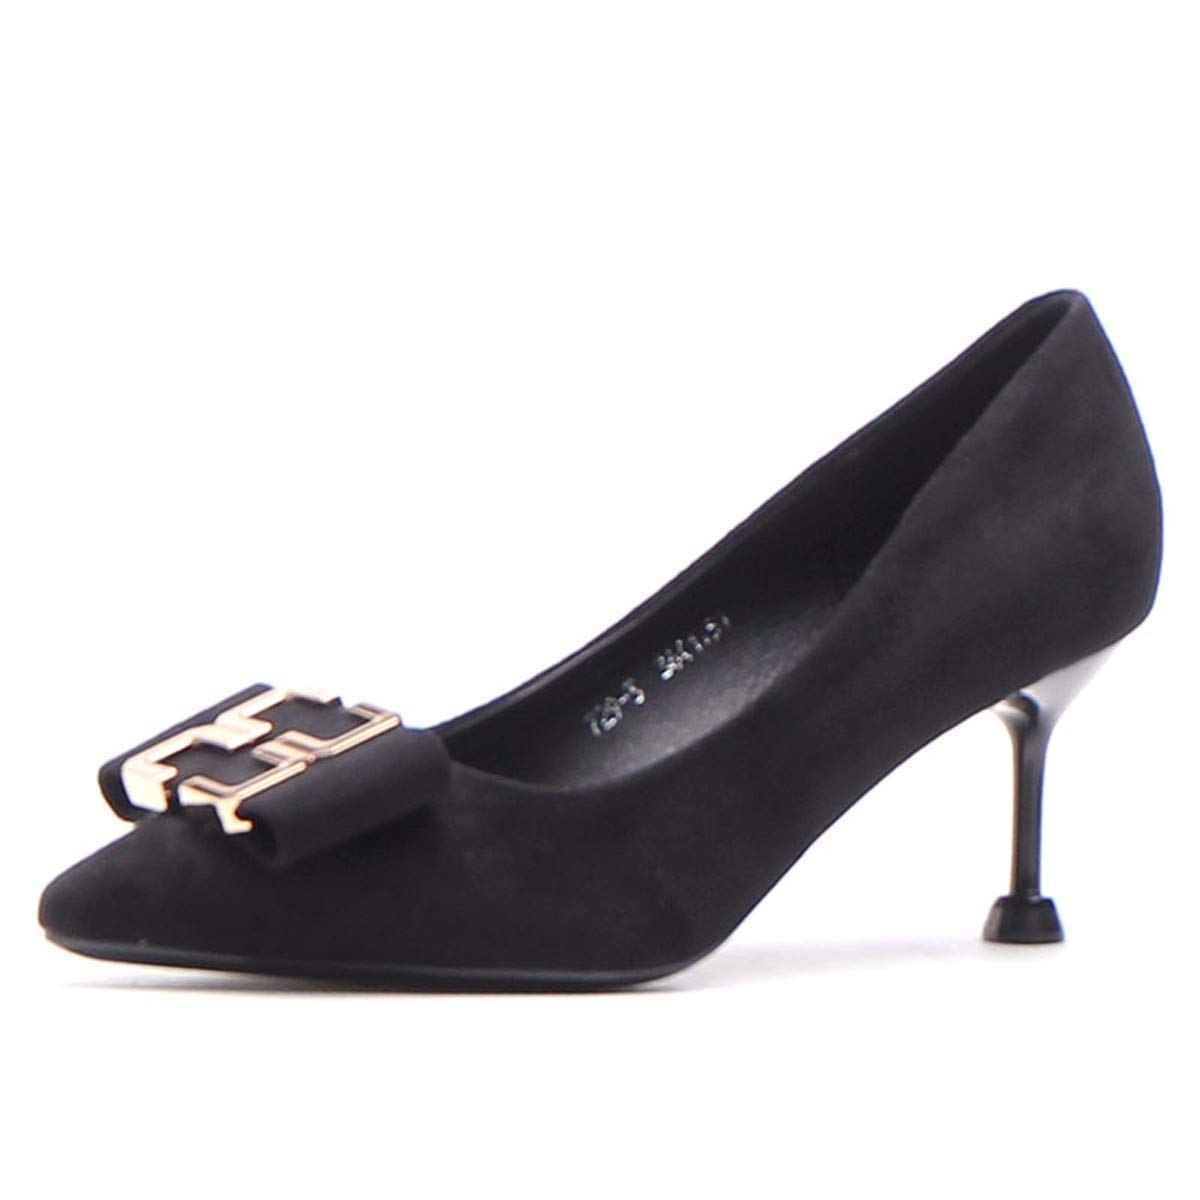 HBDLH Damenschuhe Im Frühjahr 2019 Mädchen Heel 7 cm Flache Schuhe Spitze Dünnen Absätzen 100 Sätze Schwarz Modisch Einzelne Schuhe